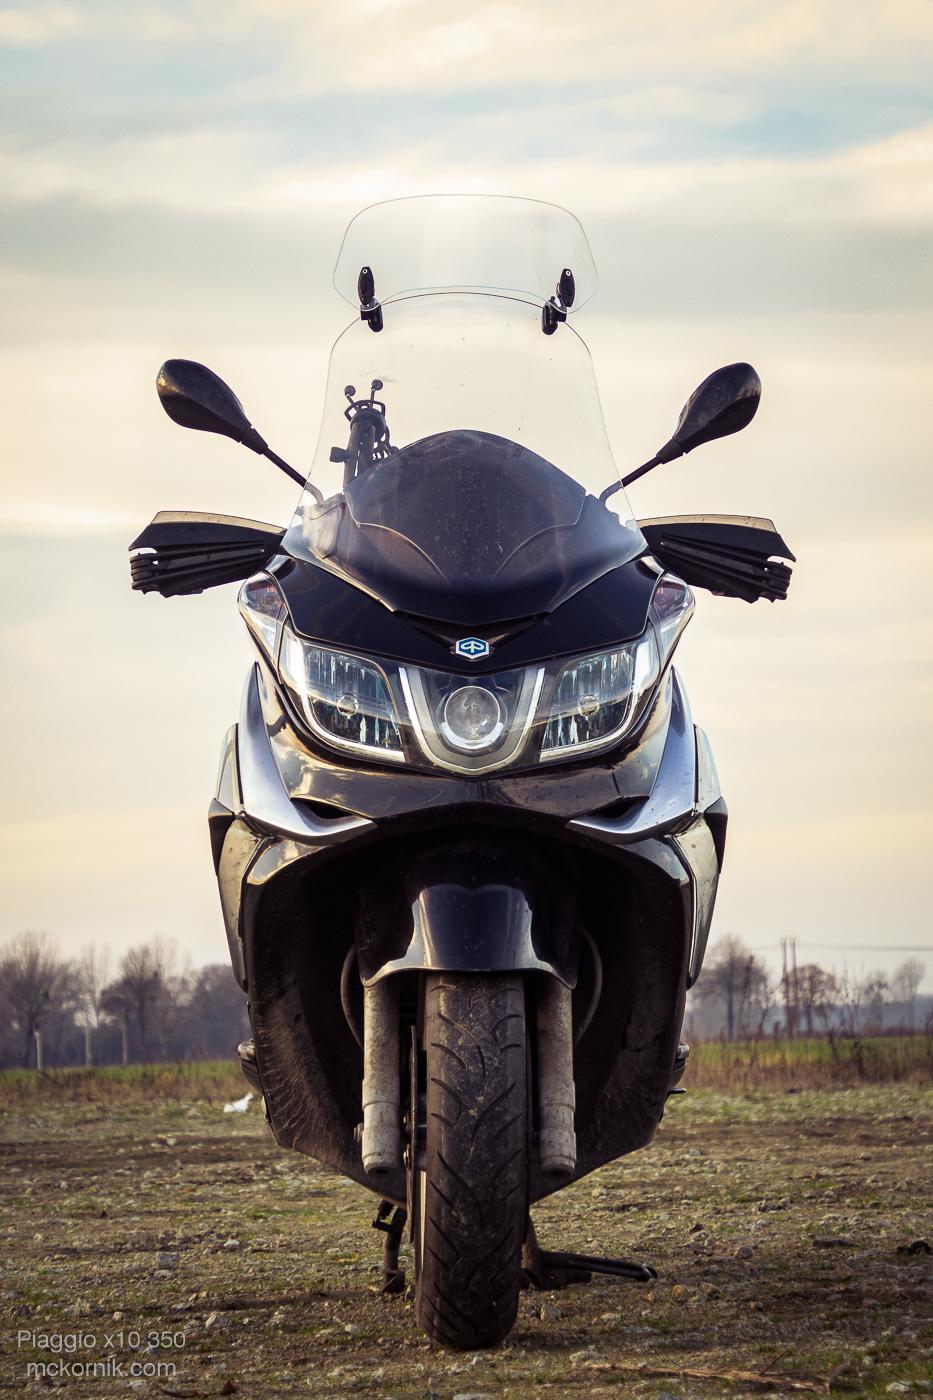 Scooter / motorcycle ride #piaggiox10, #piaggiox10350